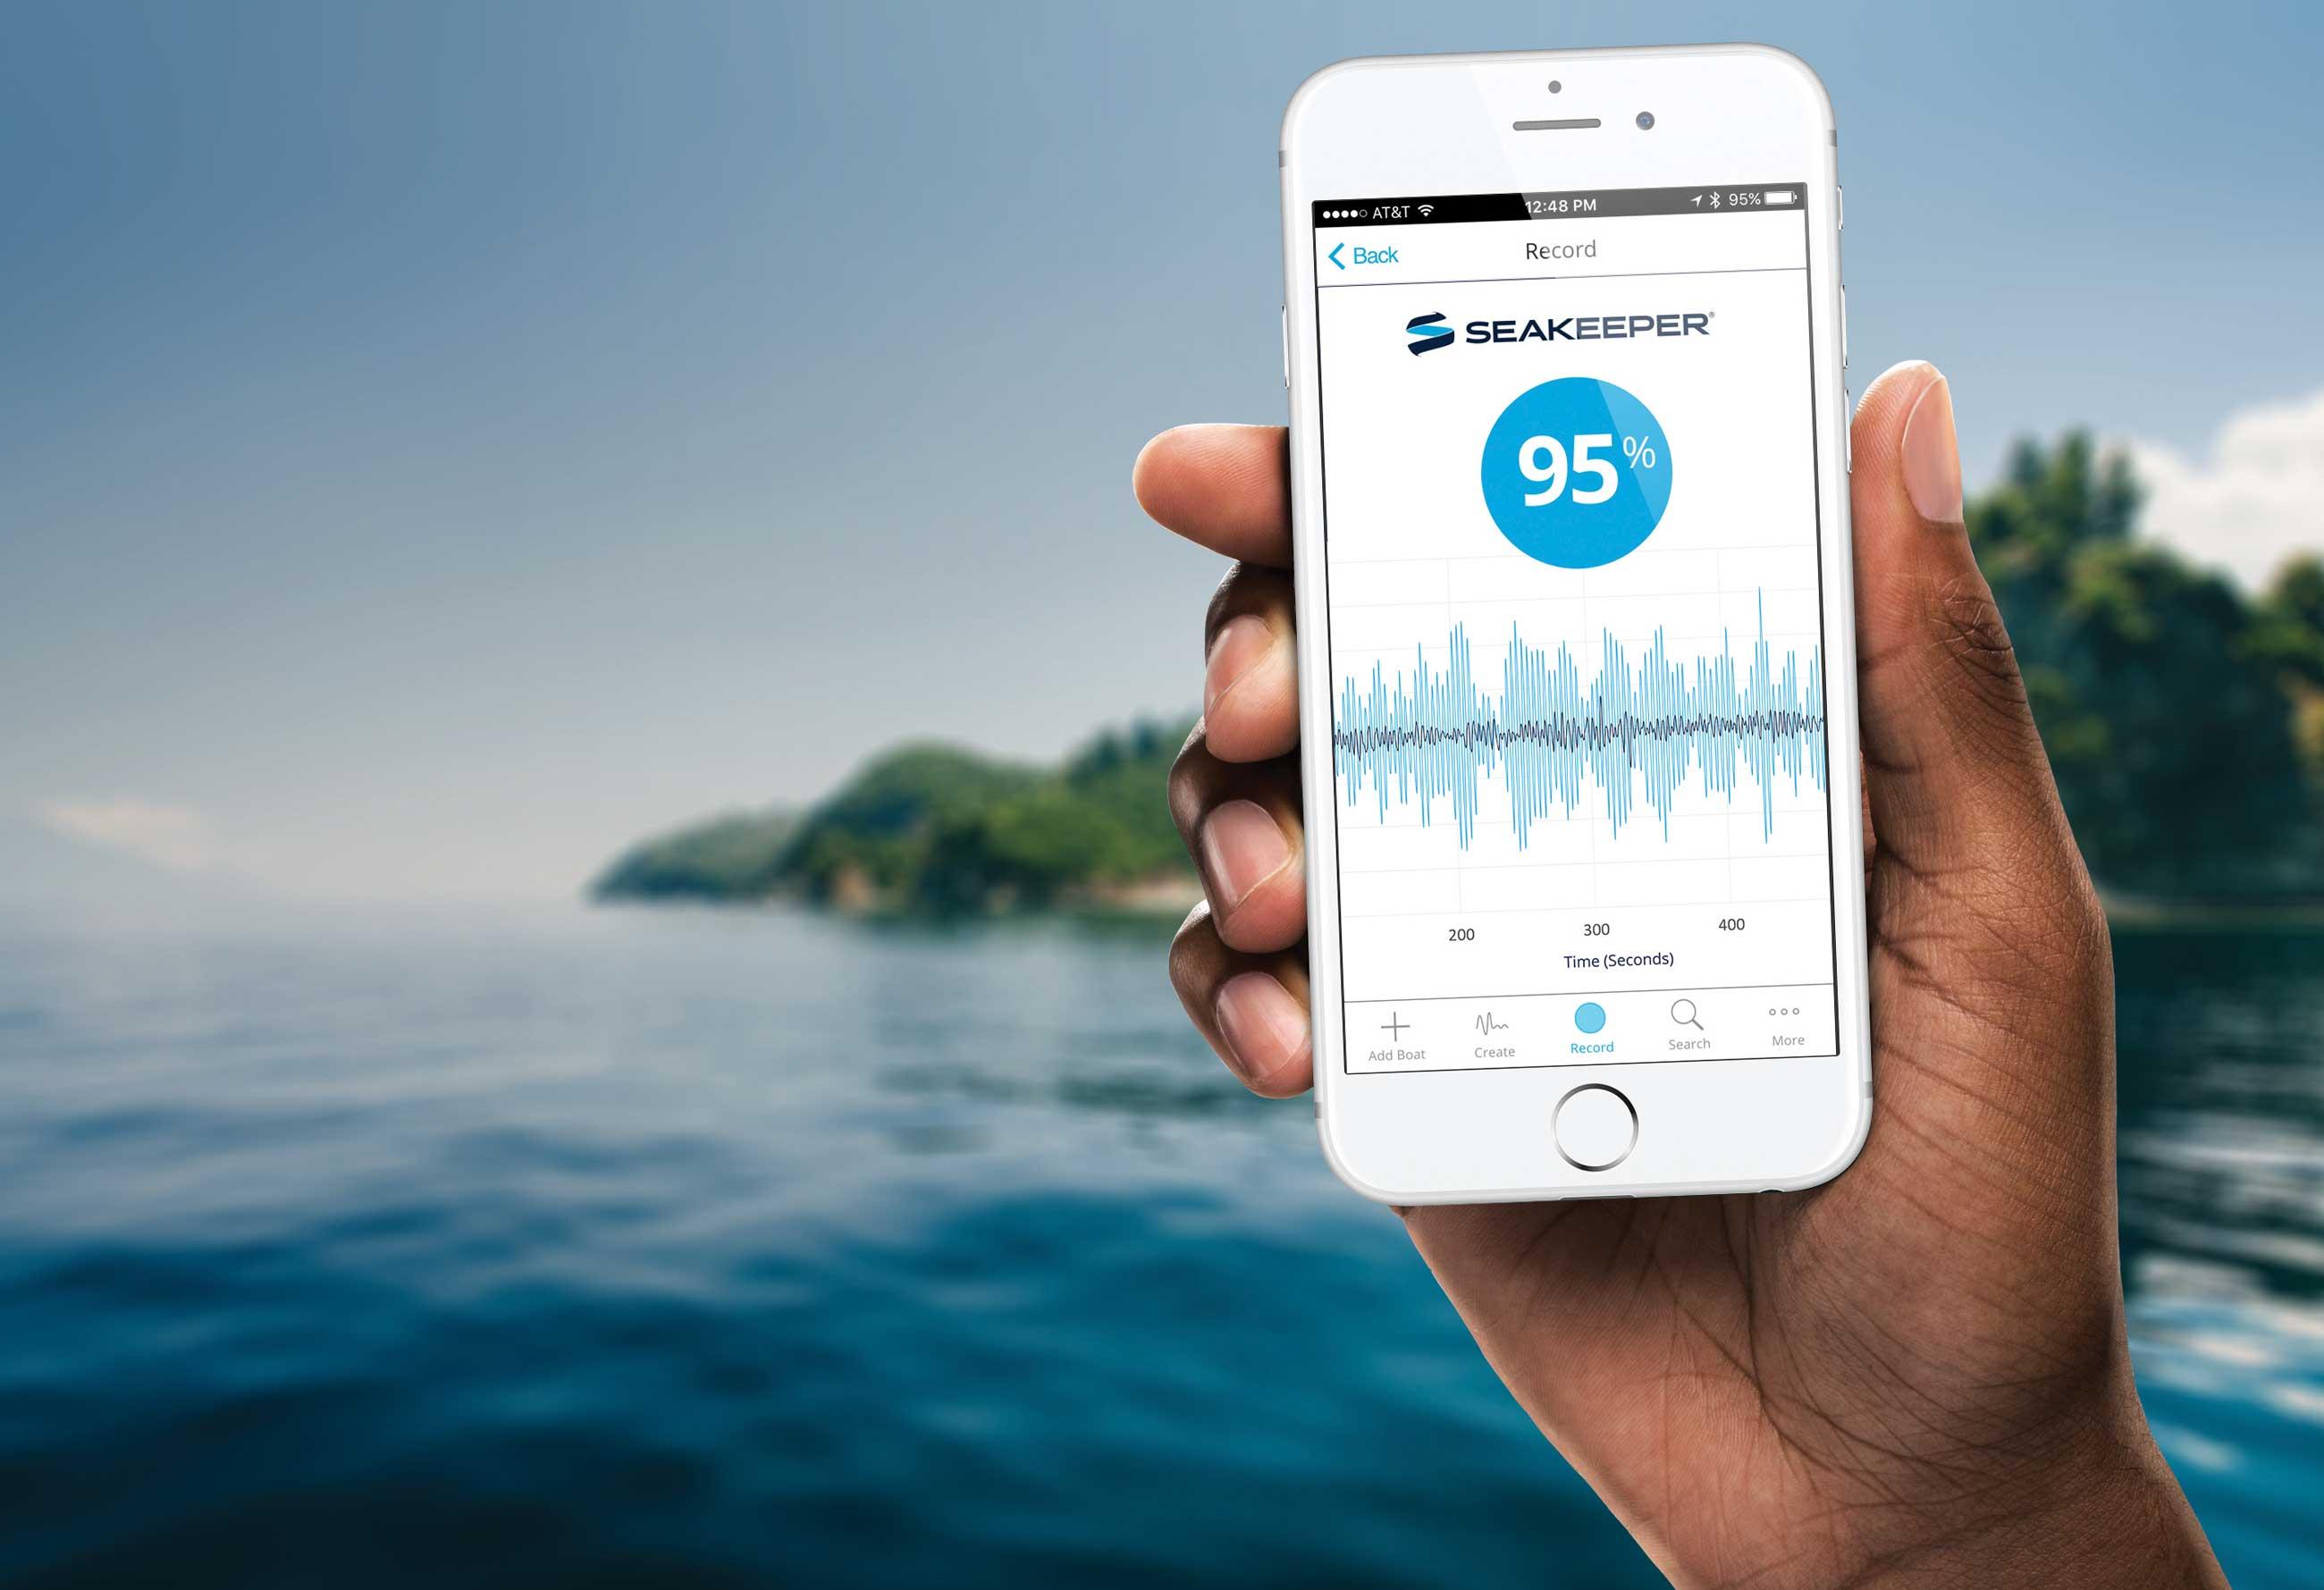 Seakeeper Mobile App Design